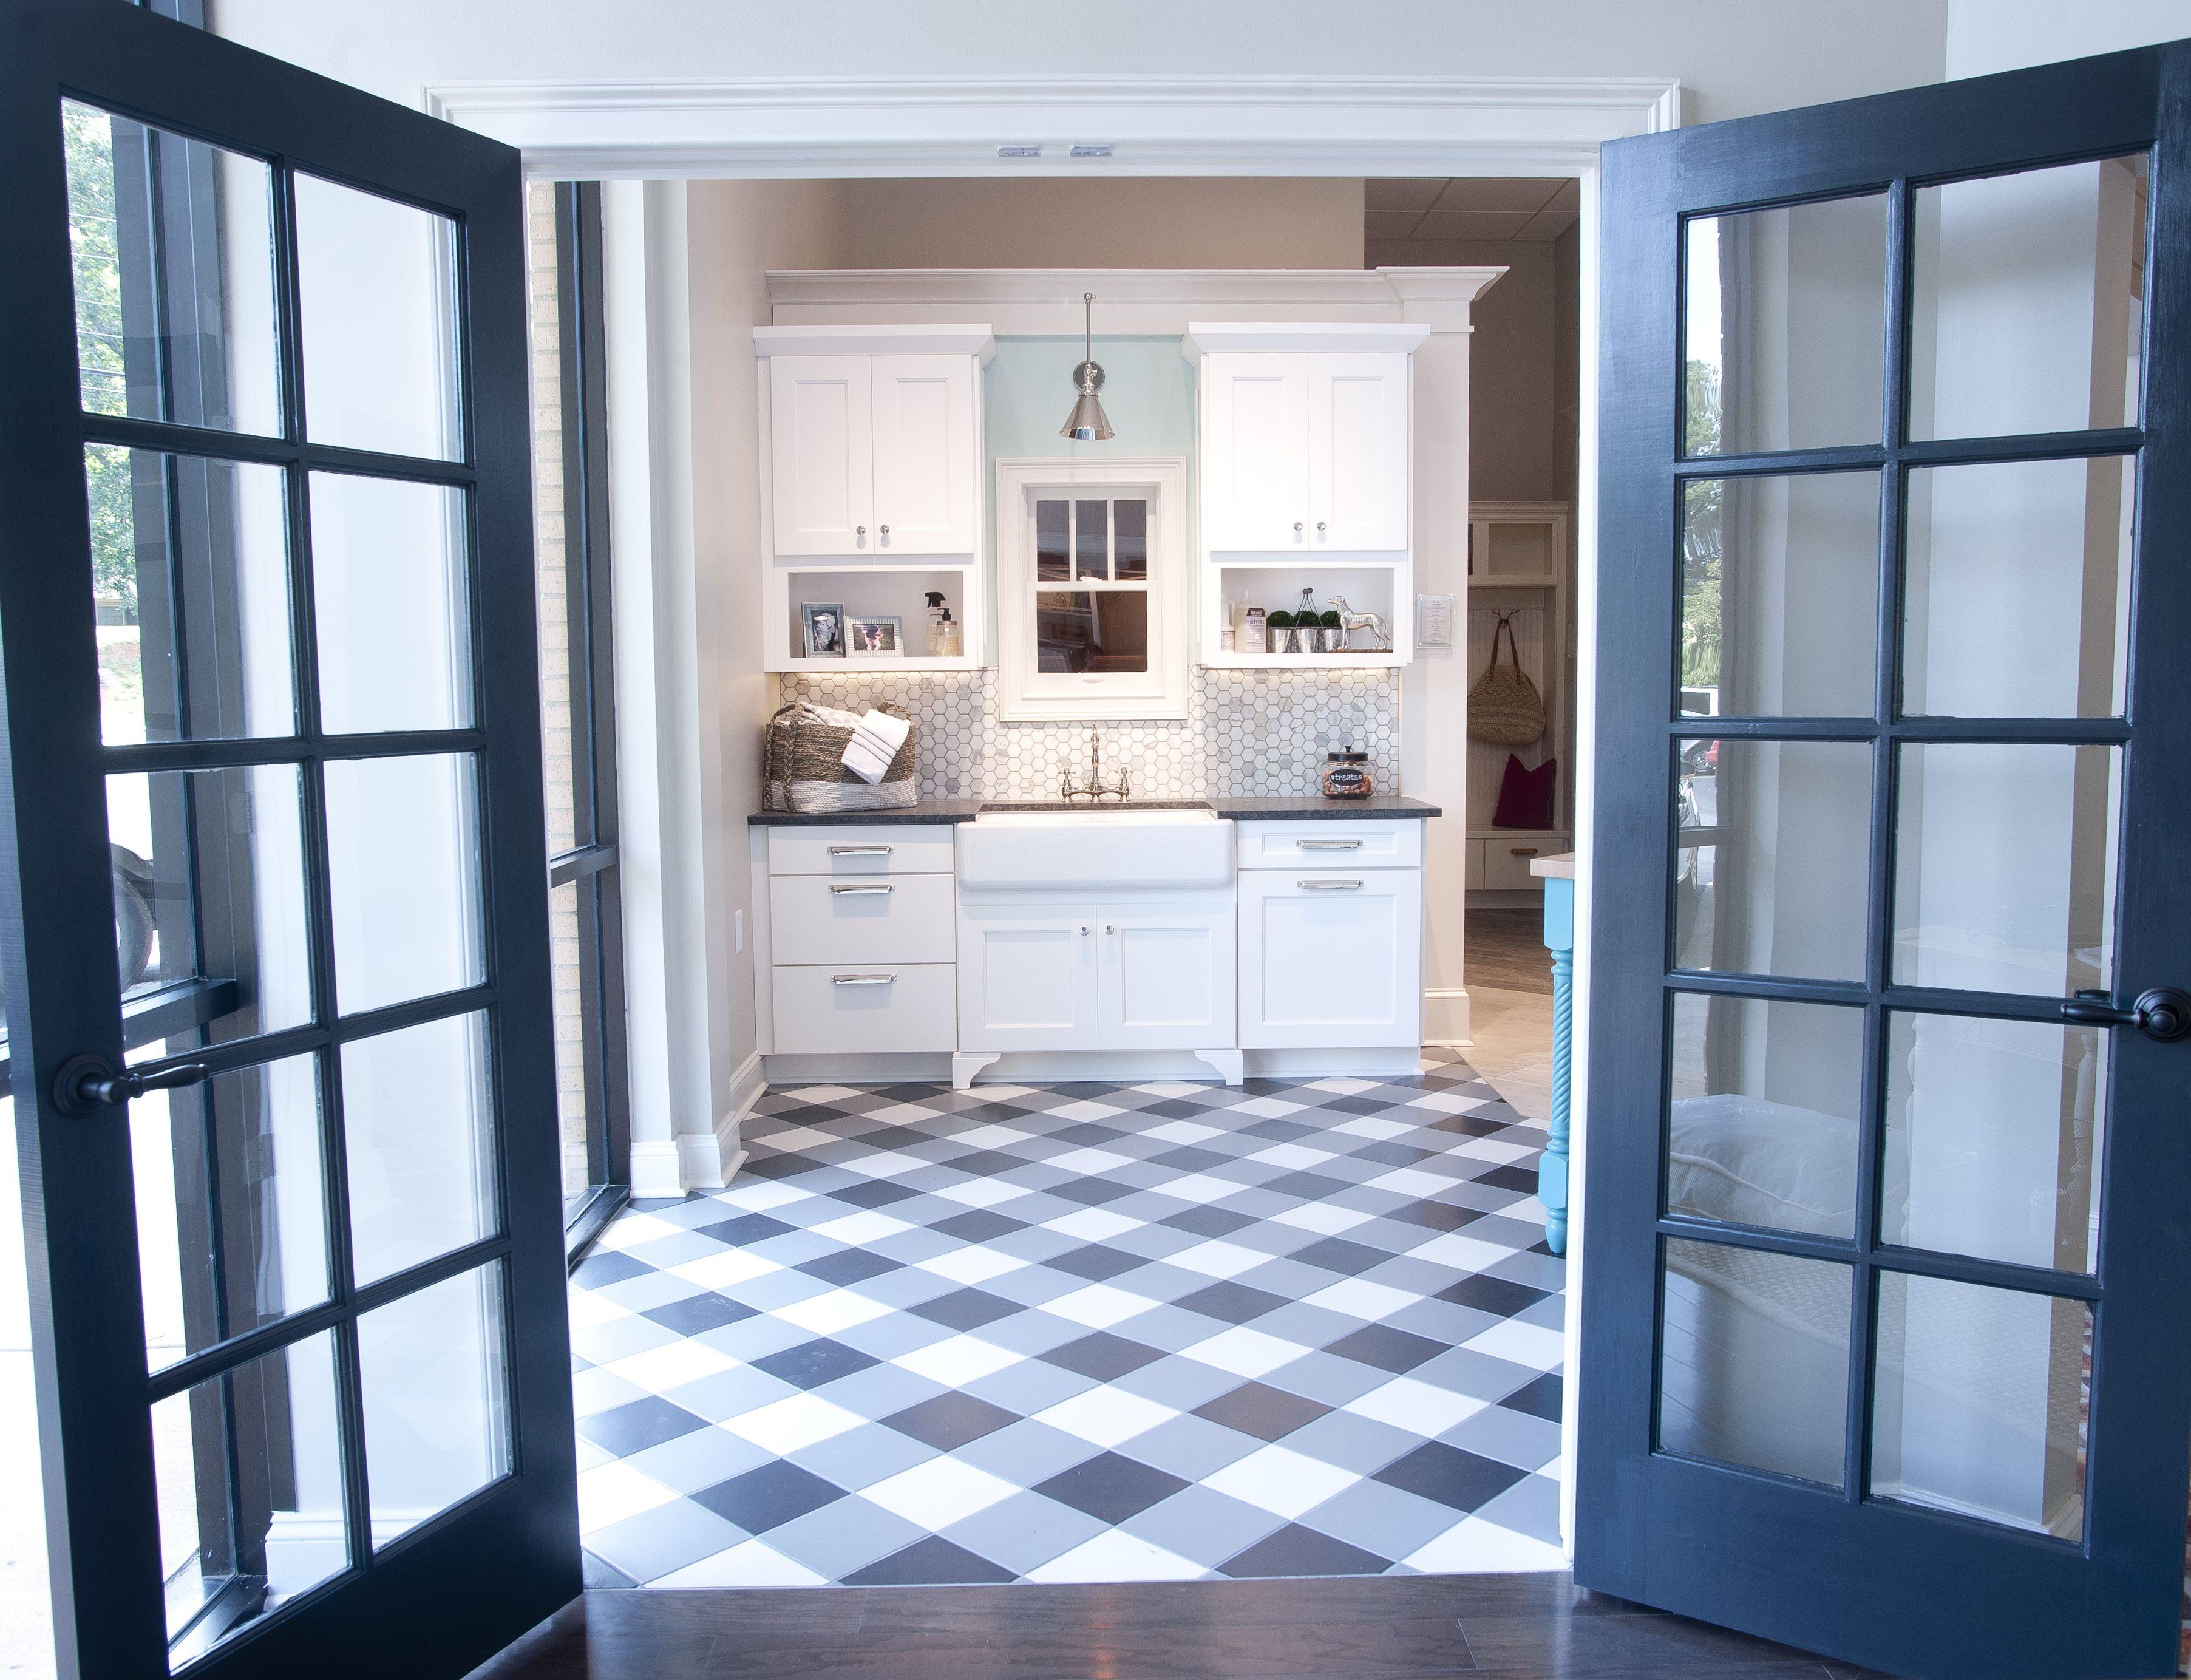 laundry room design by dalton carpet one wellborn cabinets finish glacier mdf door style